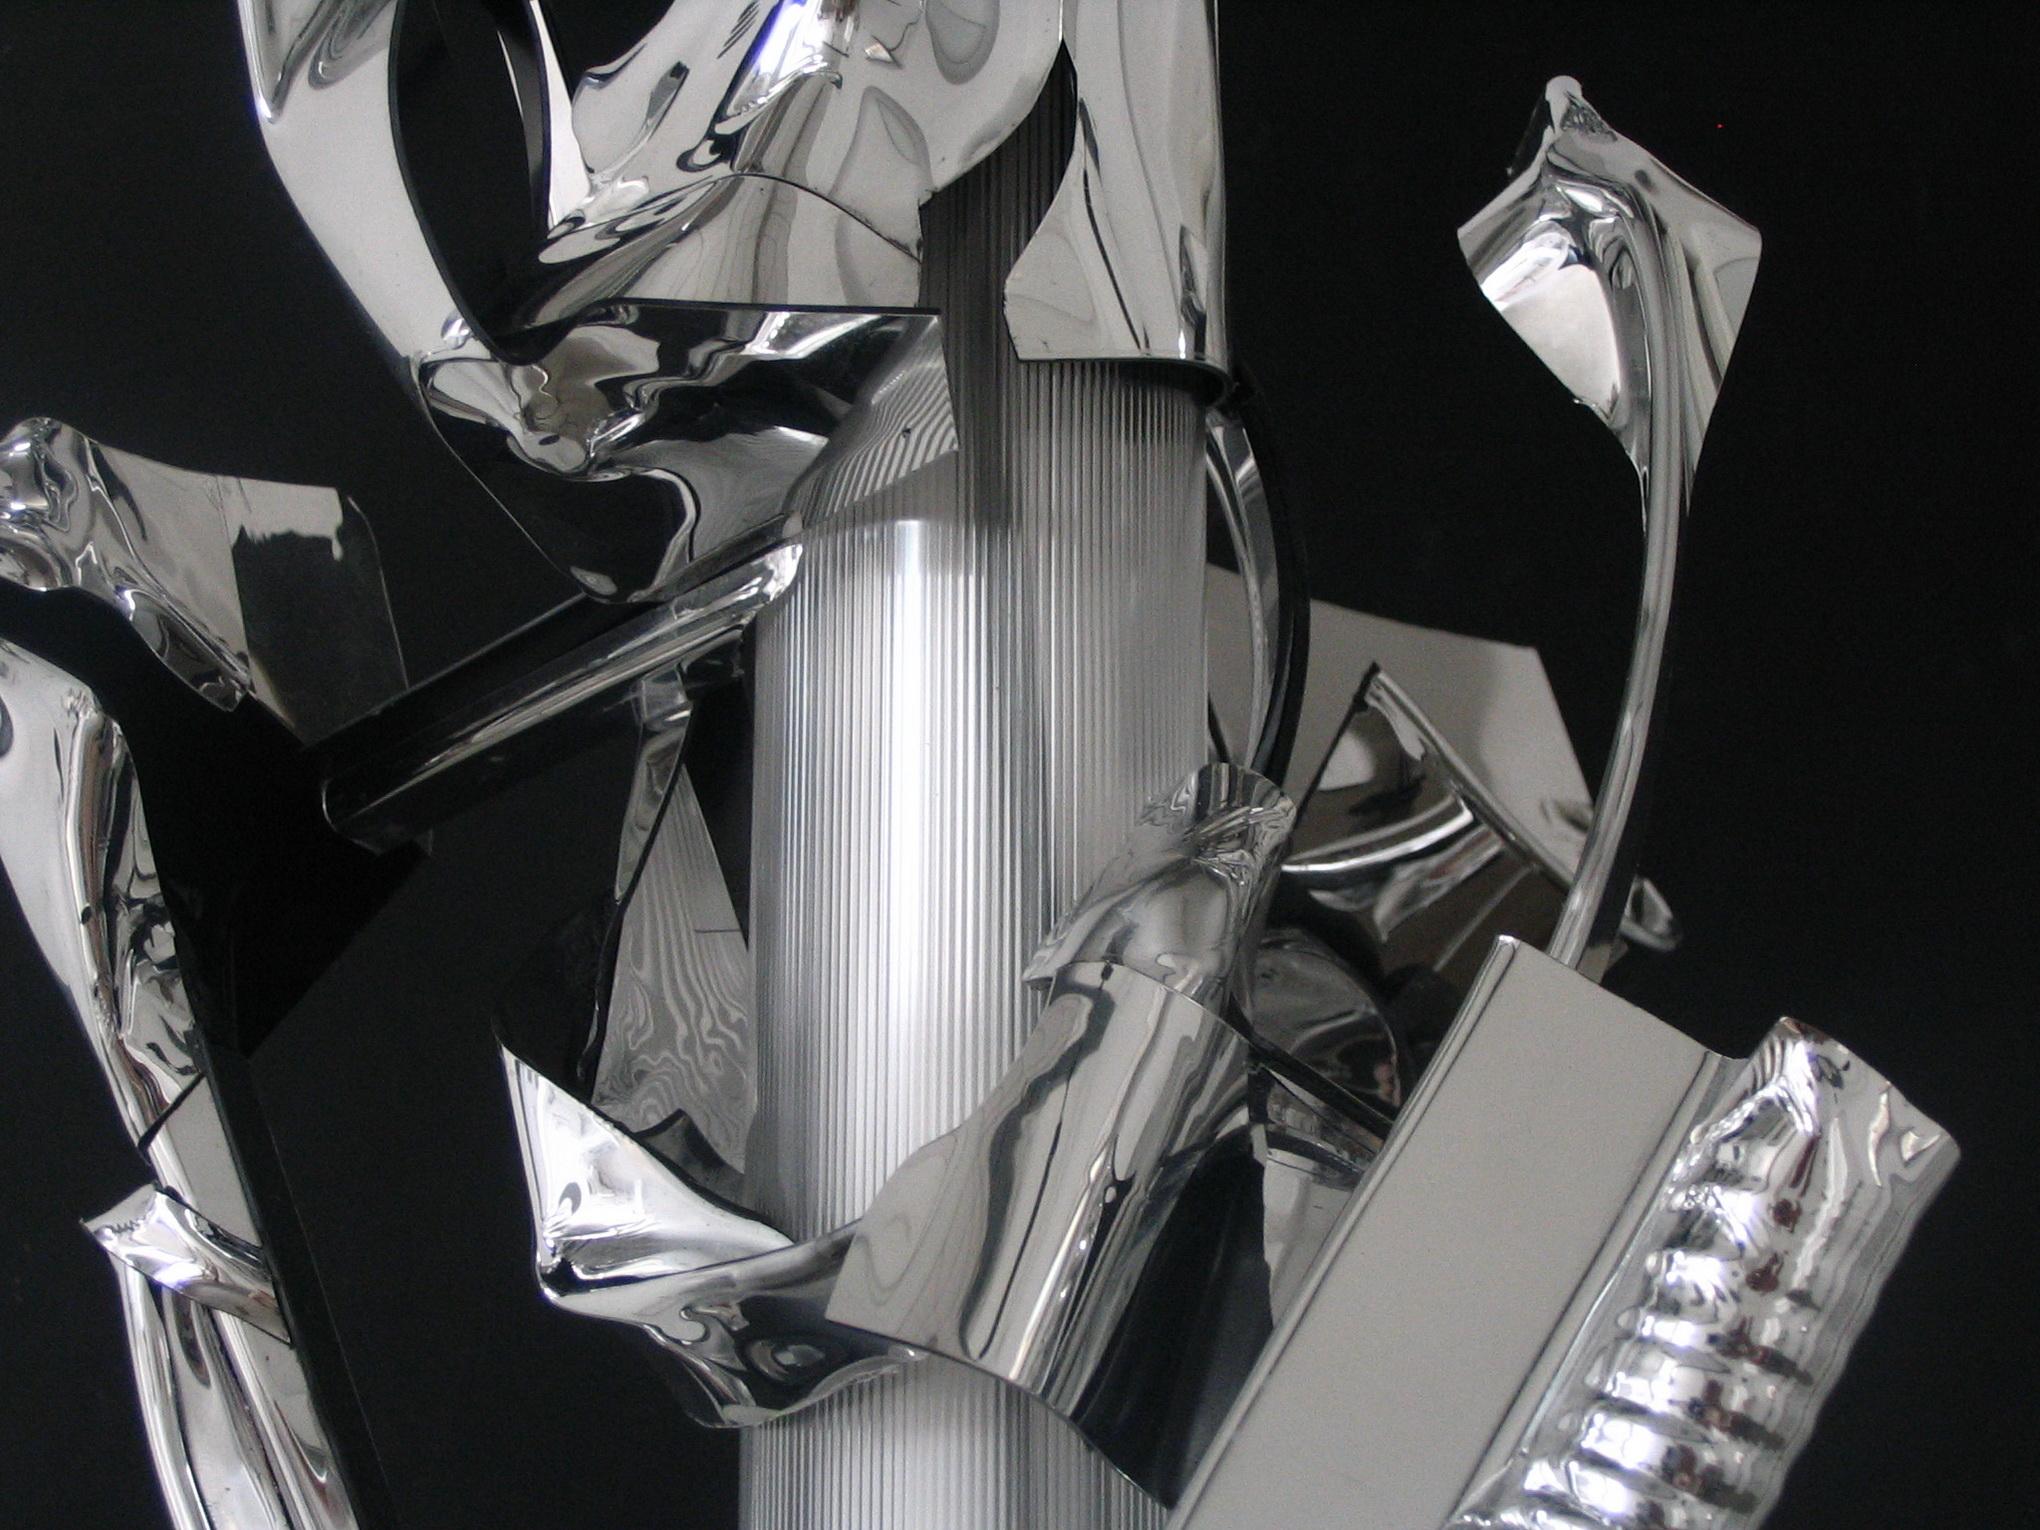 Maurizio Aprea - Metalstica - Scultura